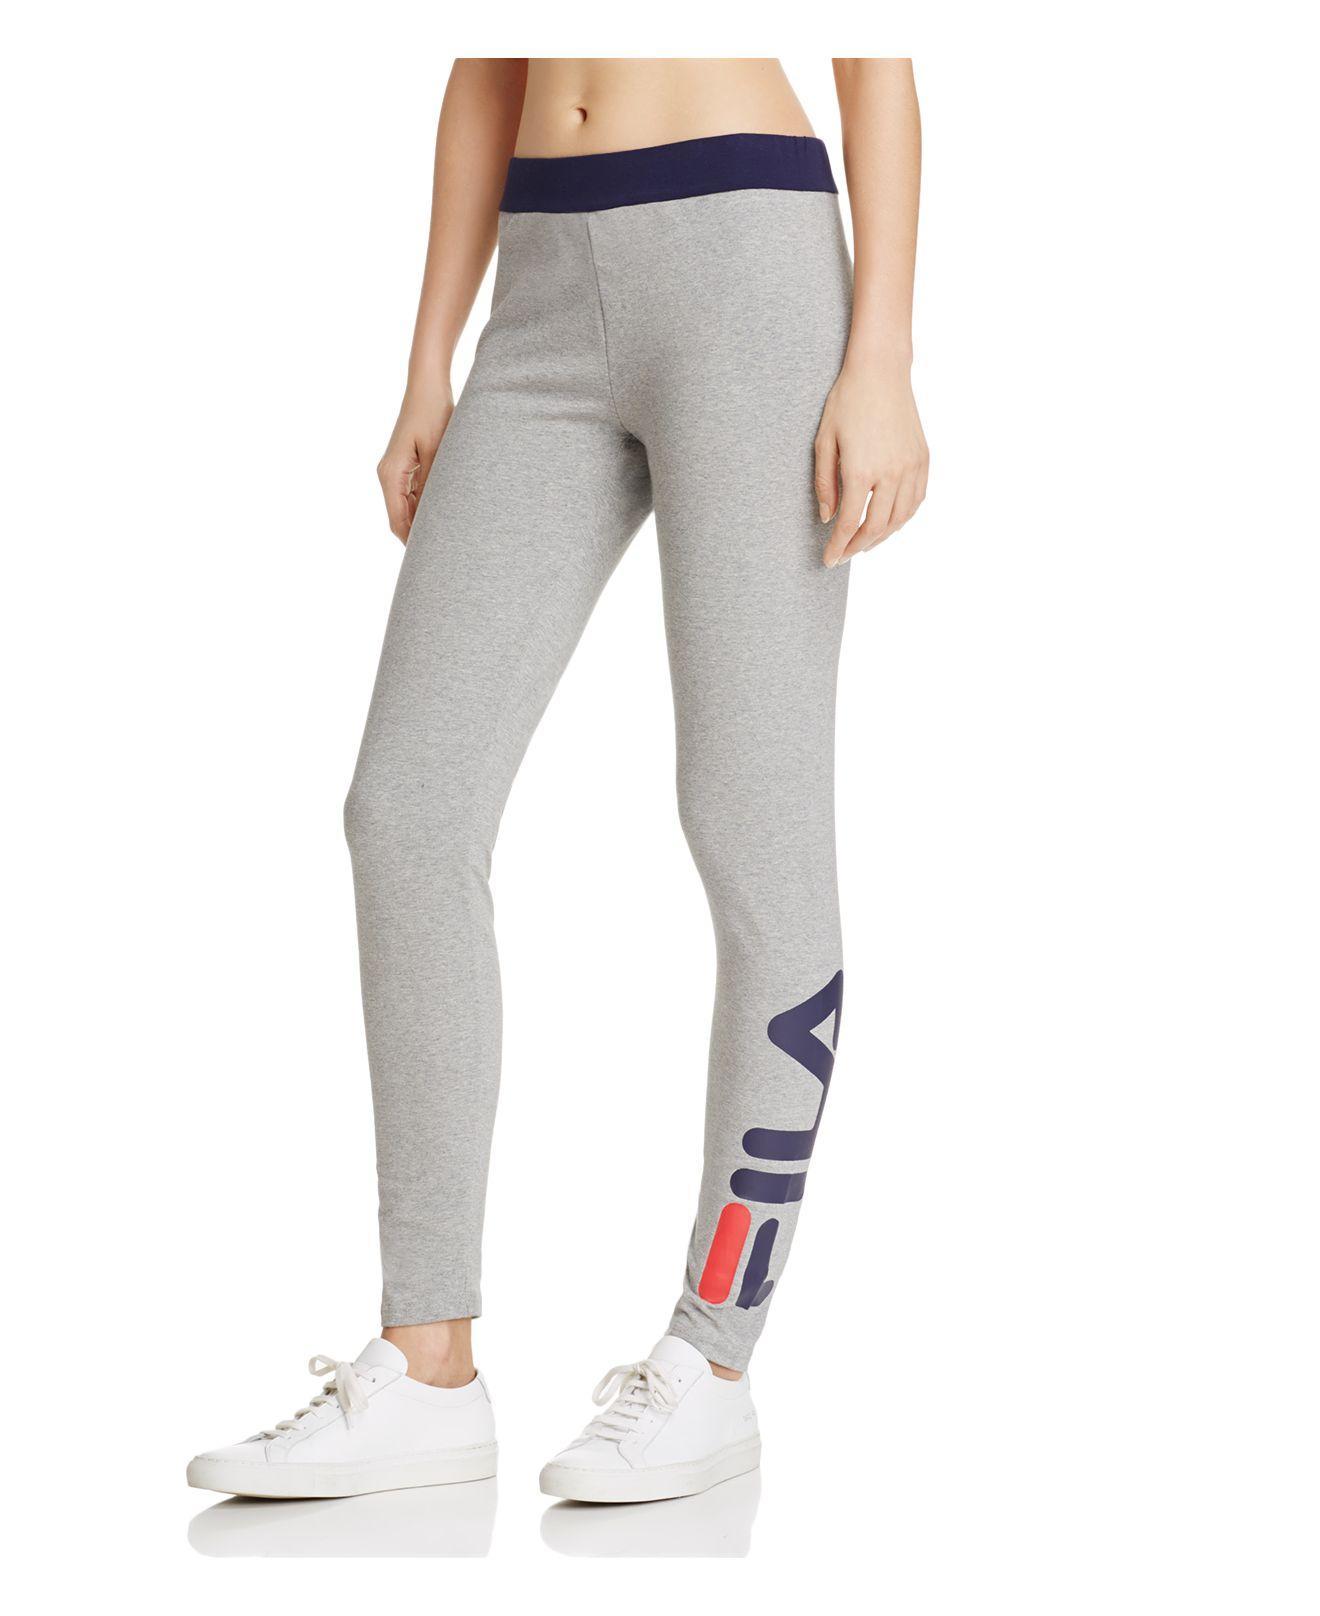 fila leggings grey \u003e Clearance shop